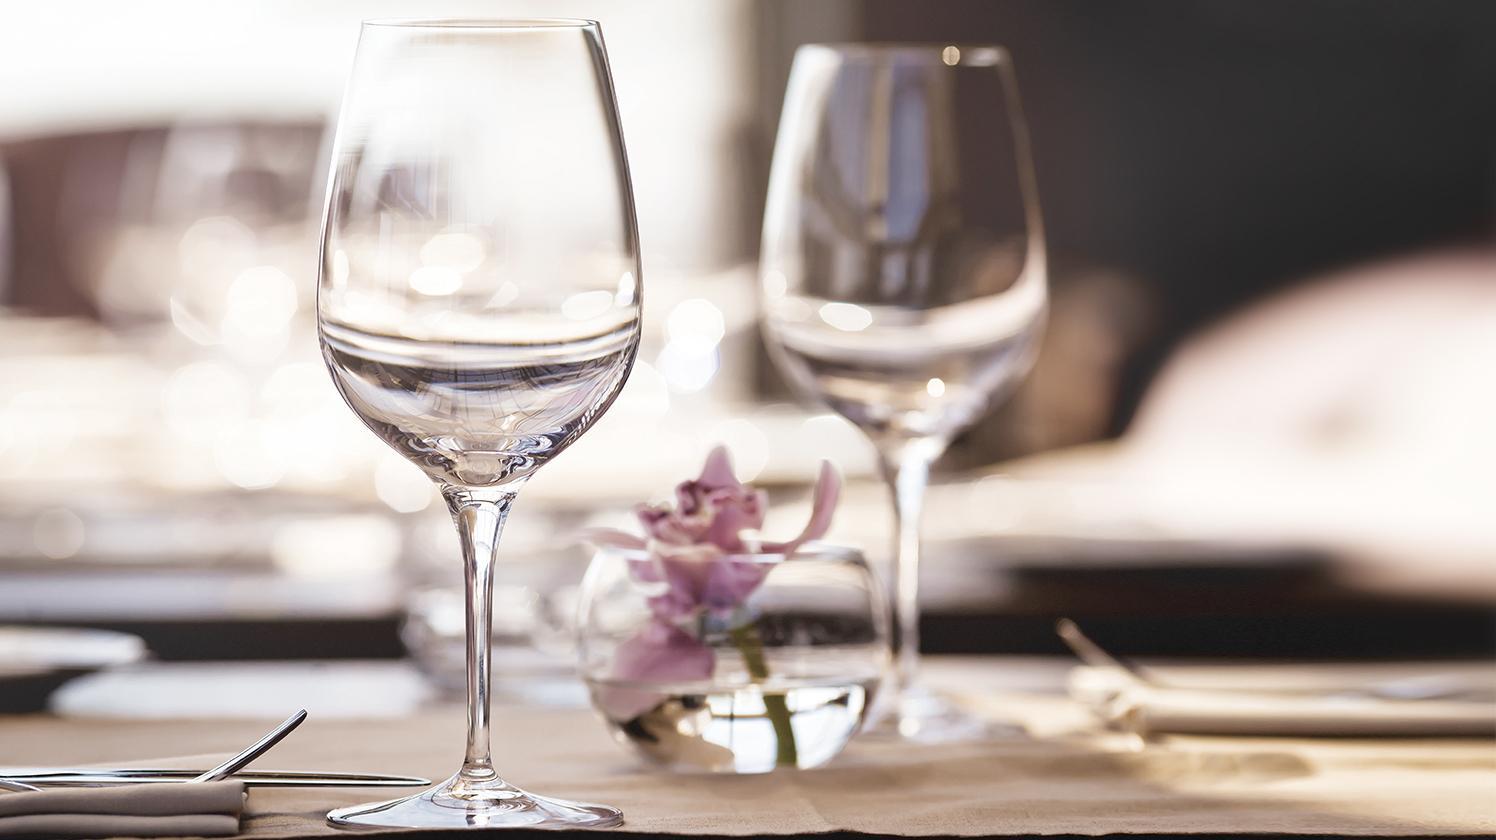 BRITA cuisine raffinée verres à vin